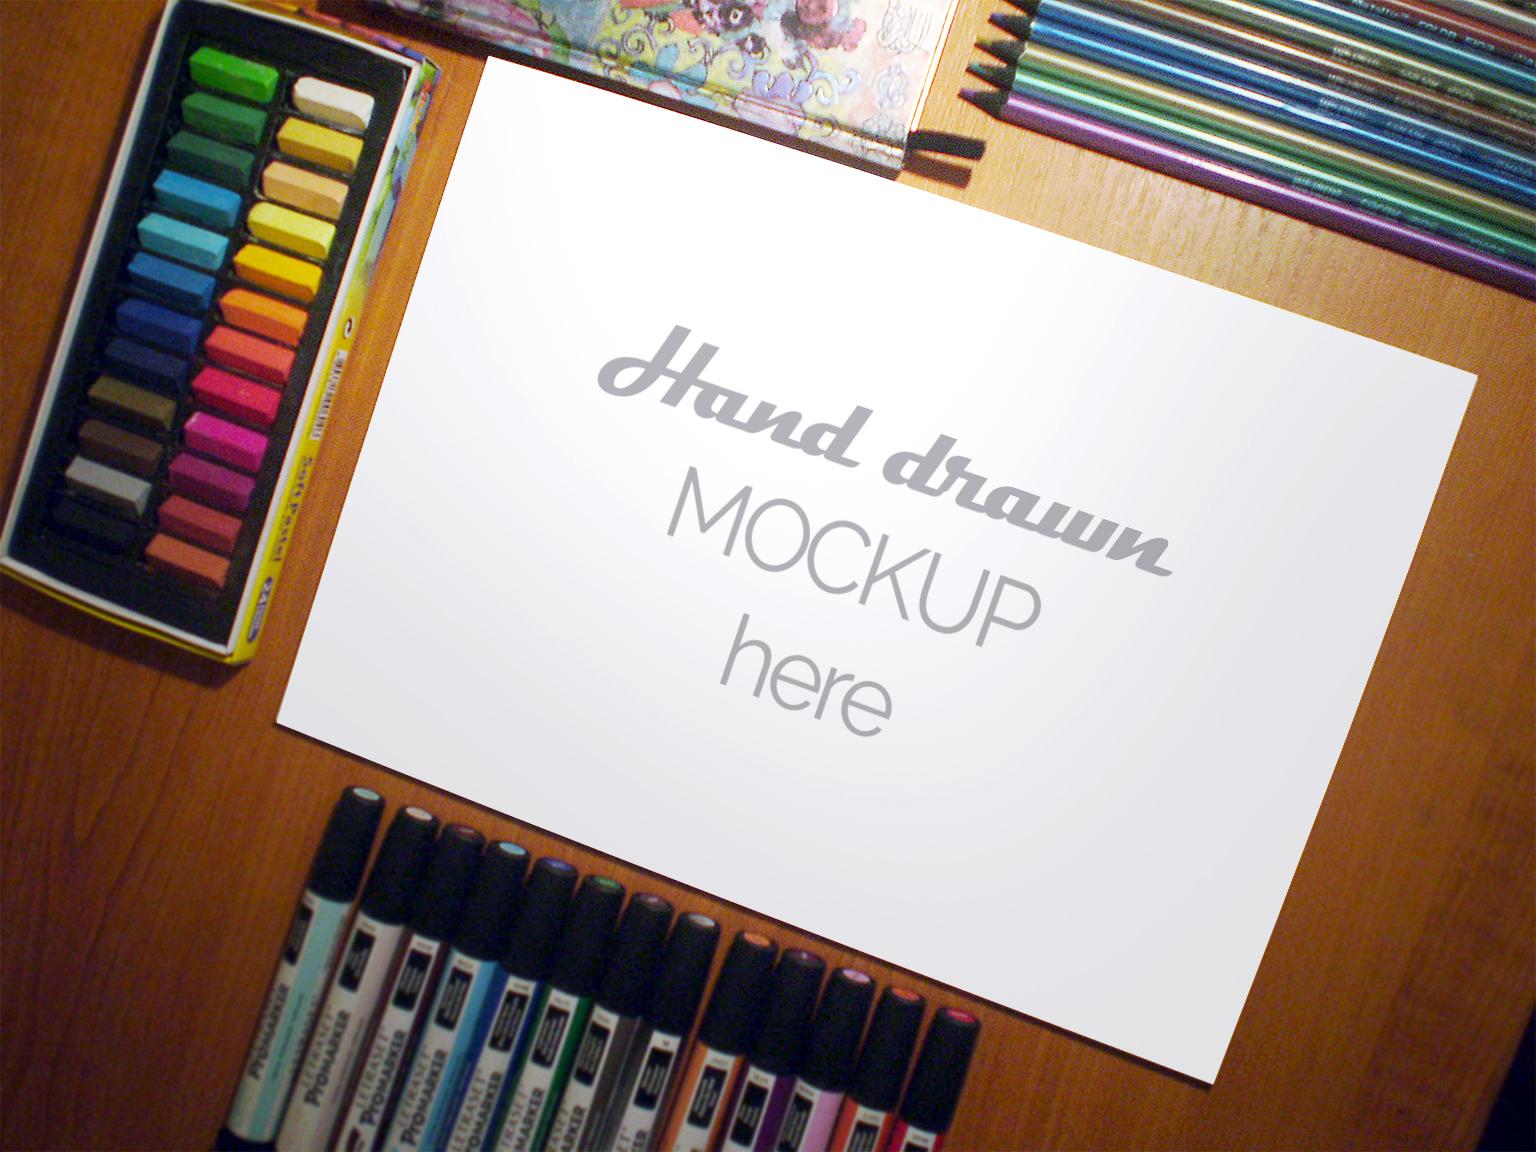 Free Sketch Artistic Mockup - Freebies